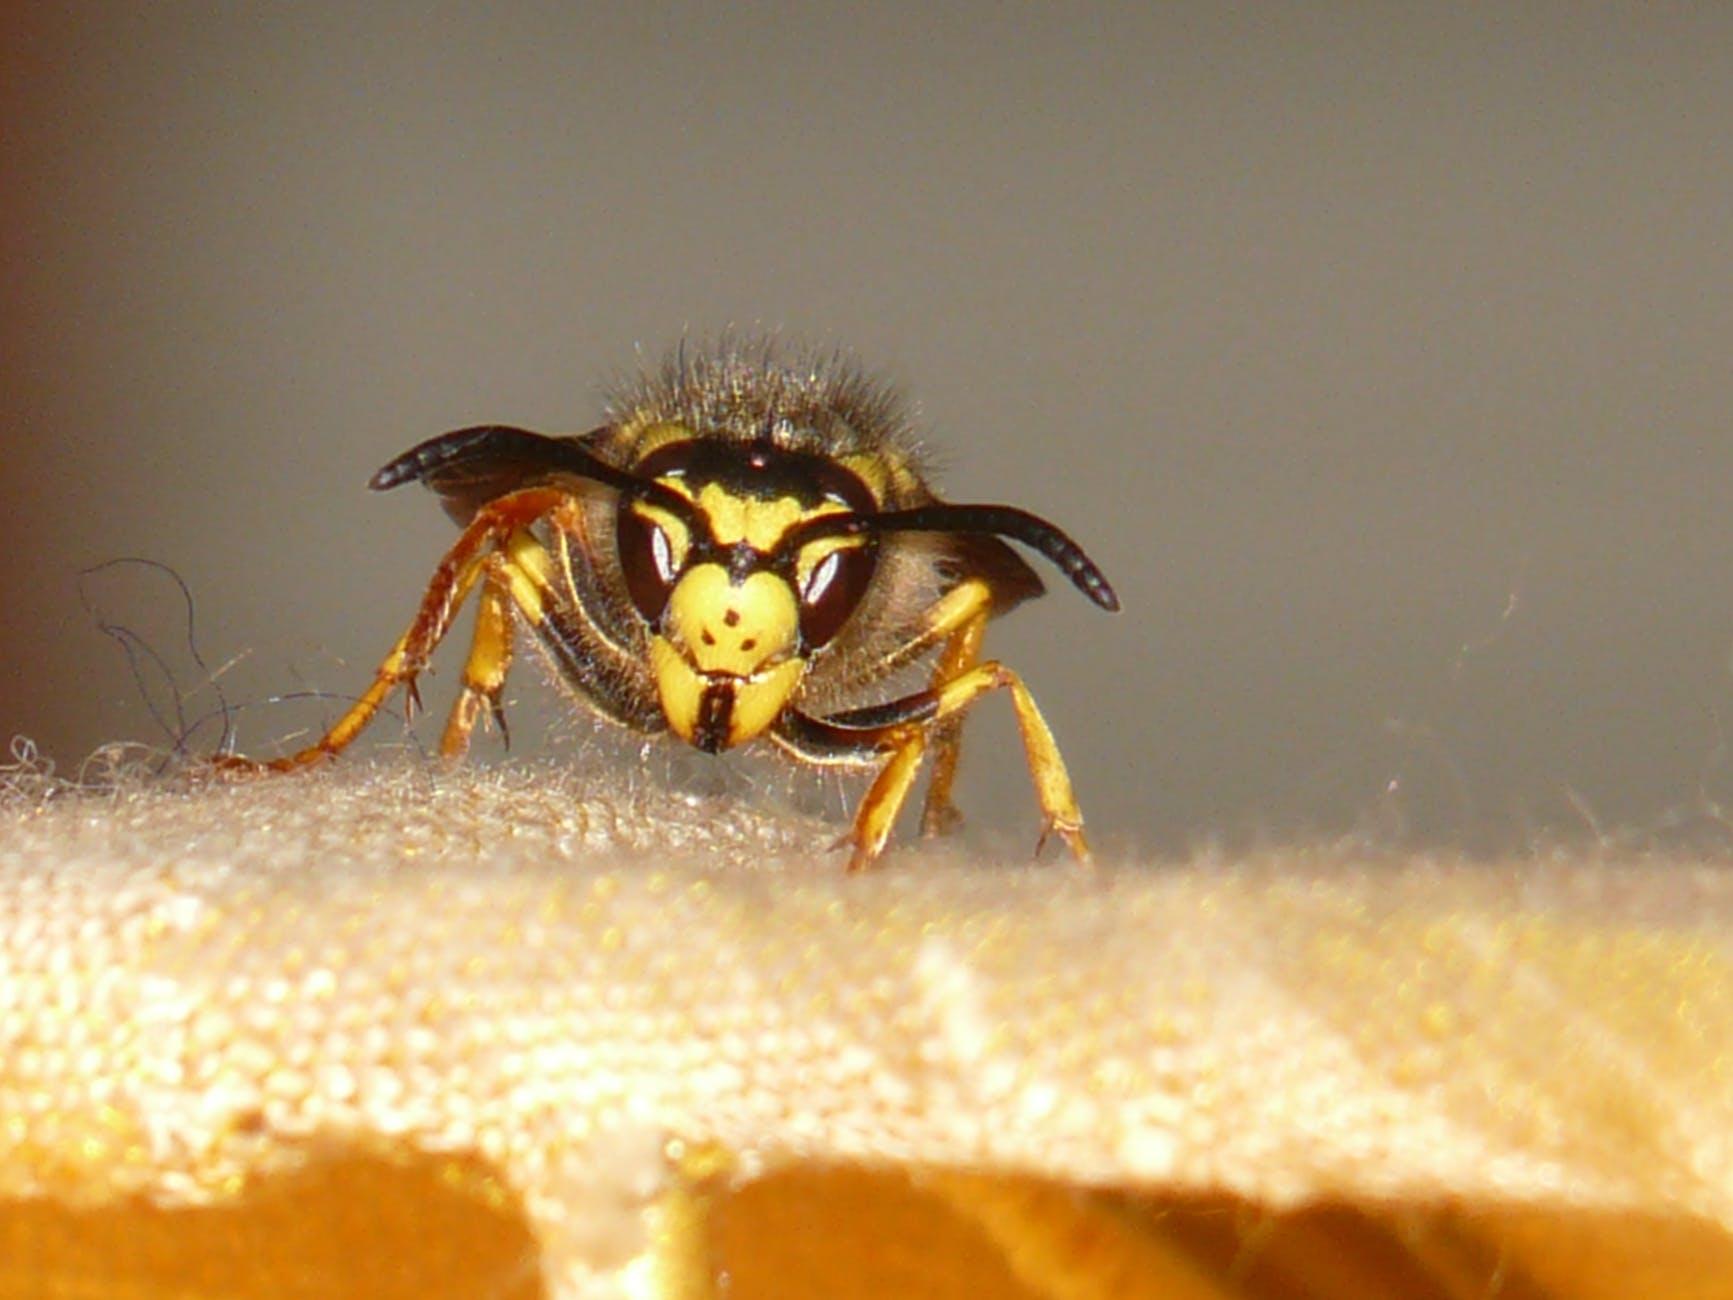 Yellow and black bee on orange textile